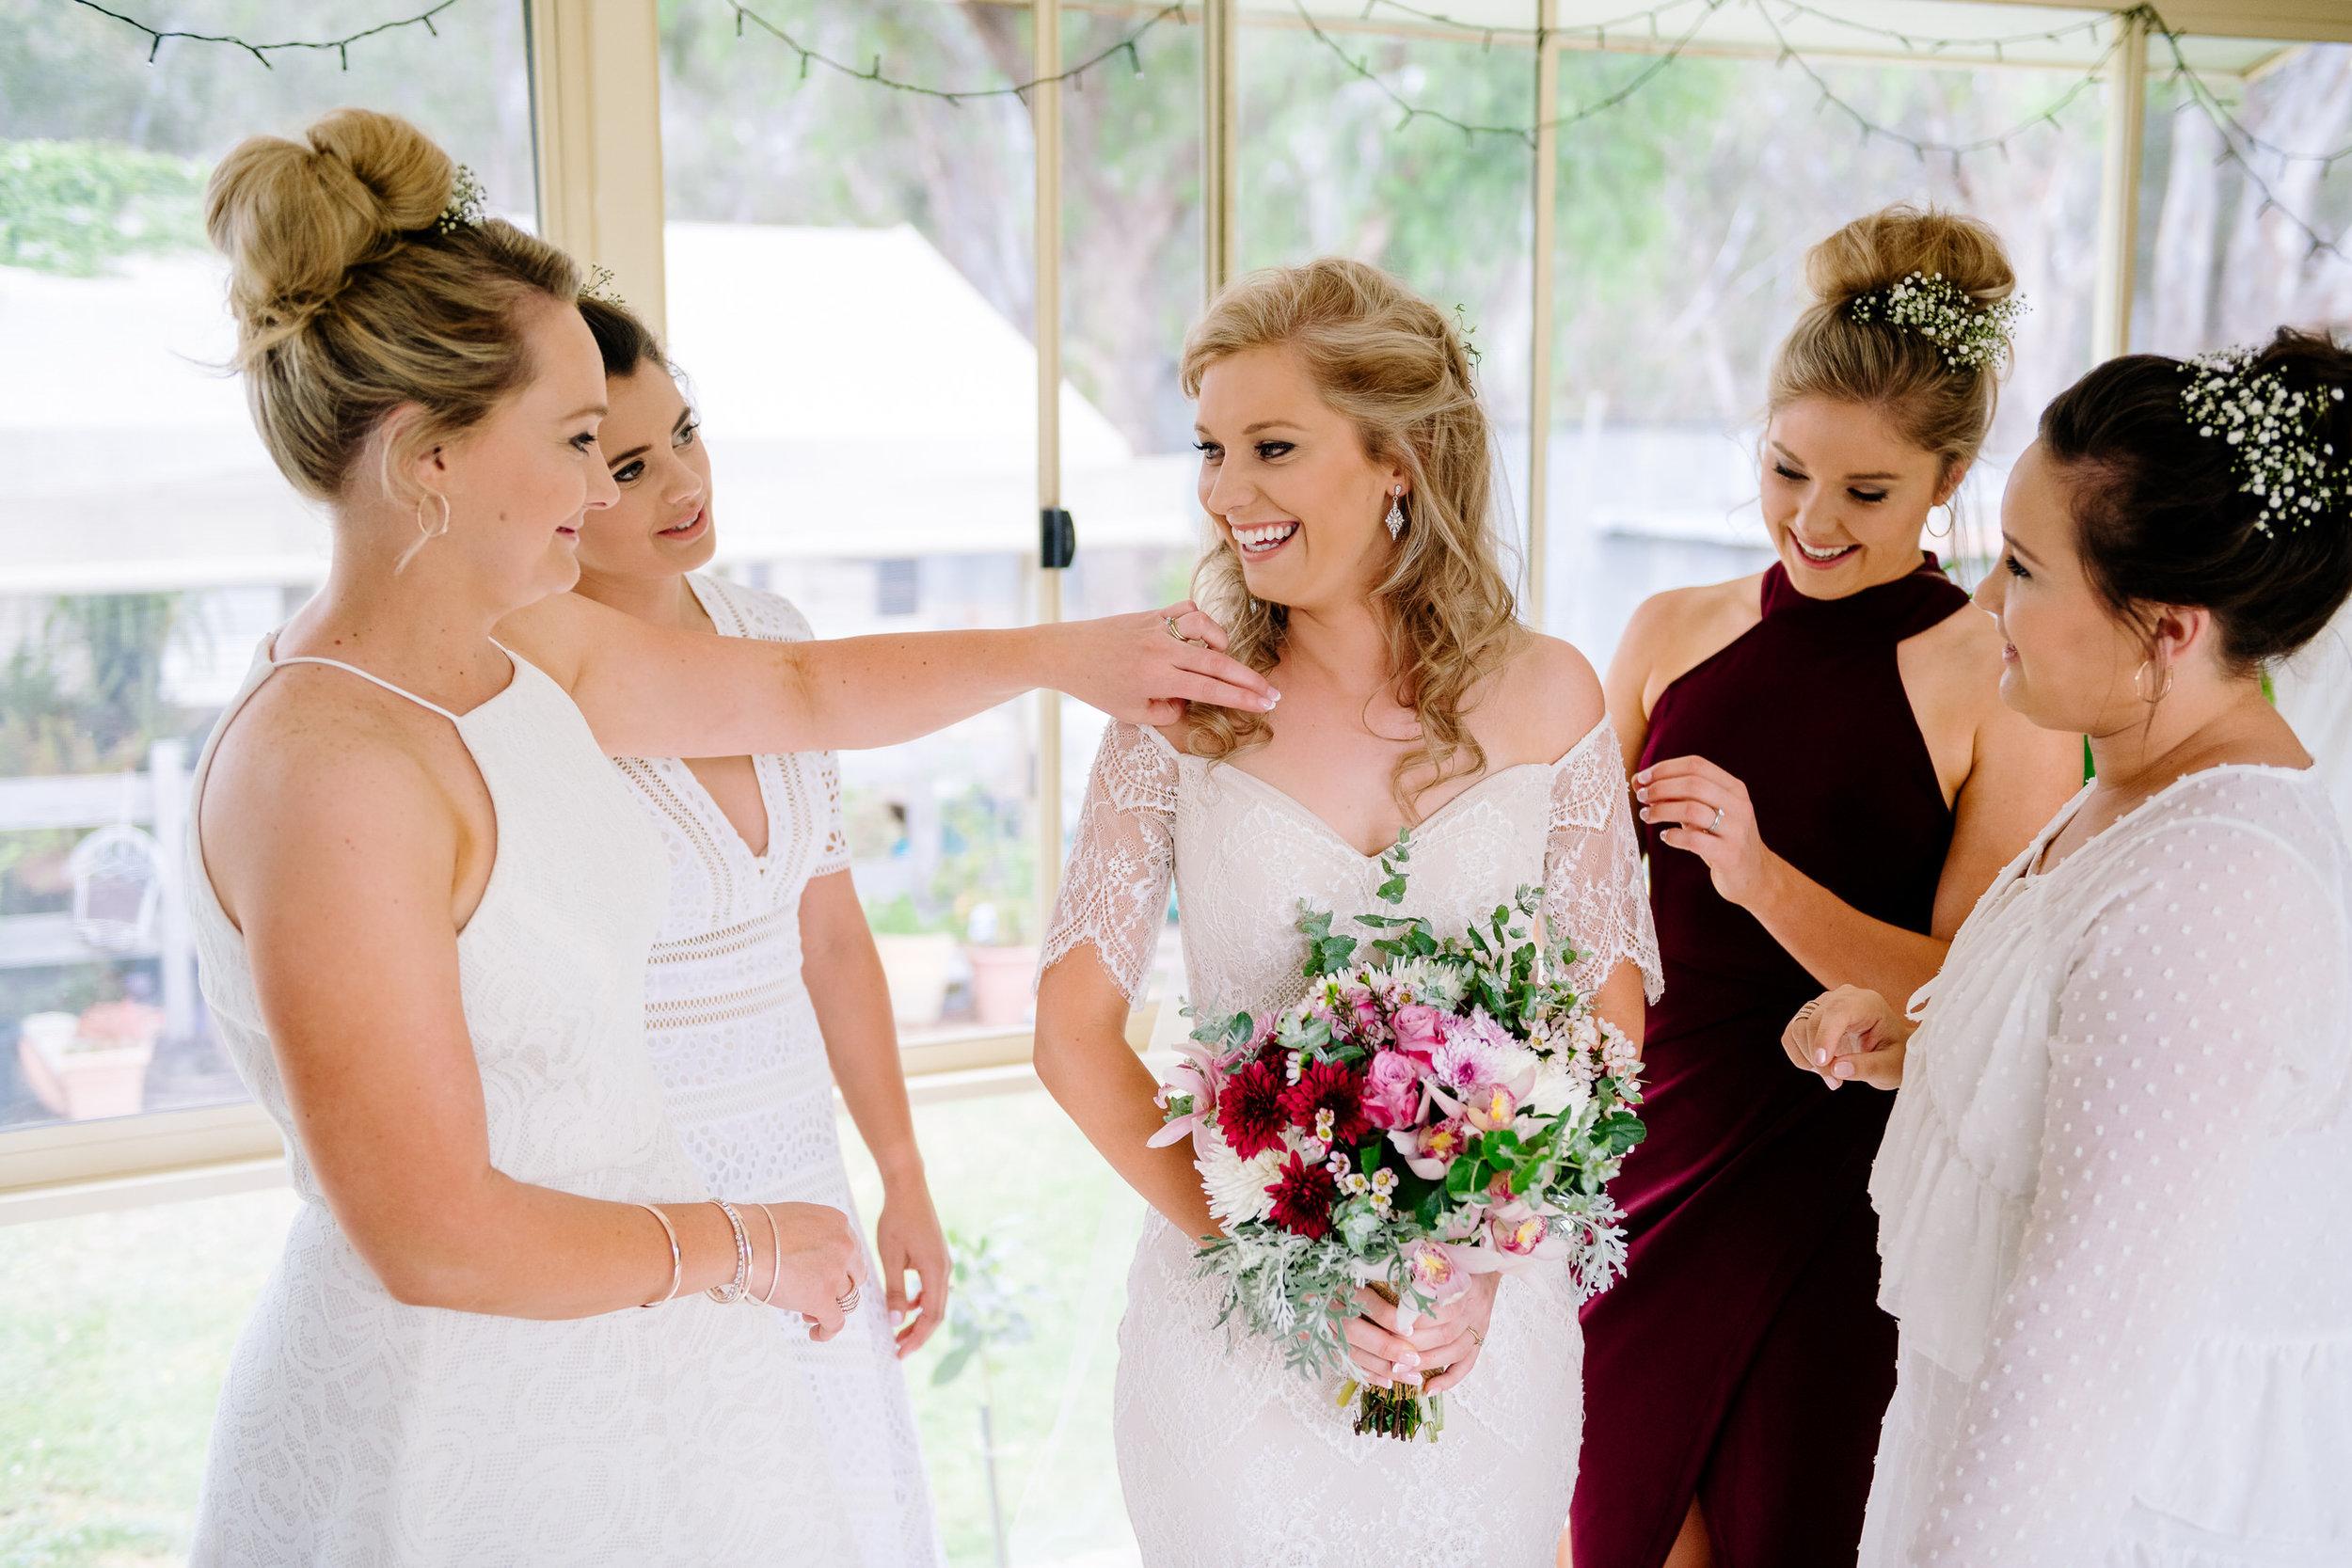 Justin_And_Jim_Photography_Backyard_Wedding154.JPG